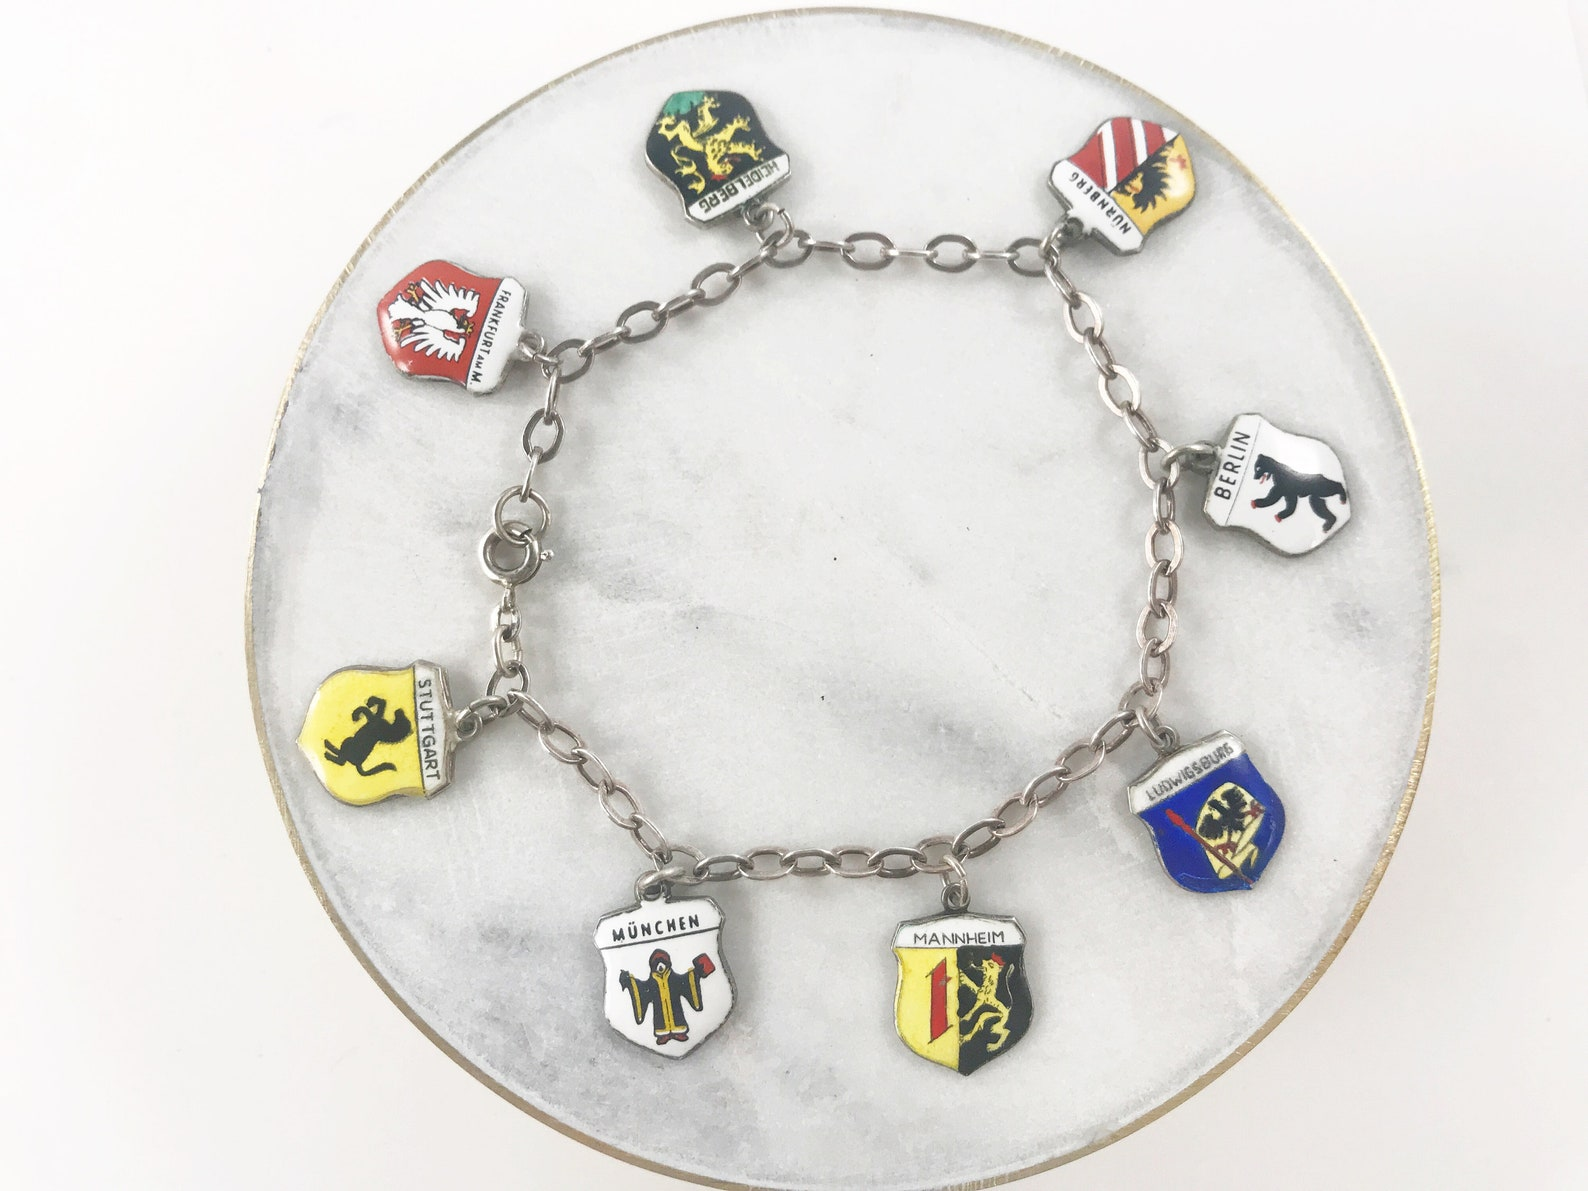 Vintage German Enamel Travel Shield Charm Bracelet with 8 Charms - 800 Silver - Mid-Century Souvenir